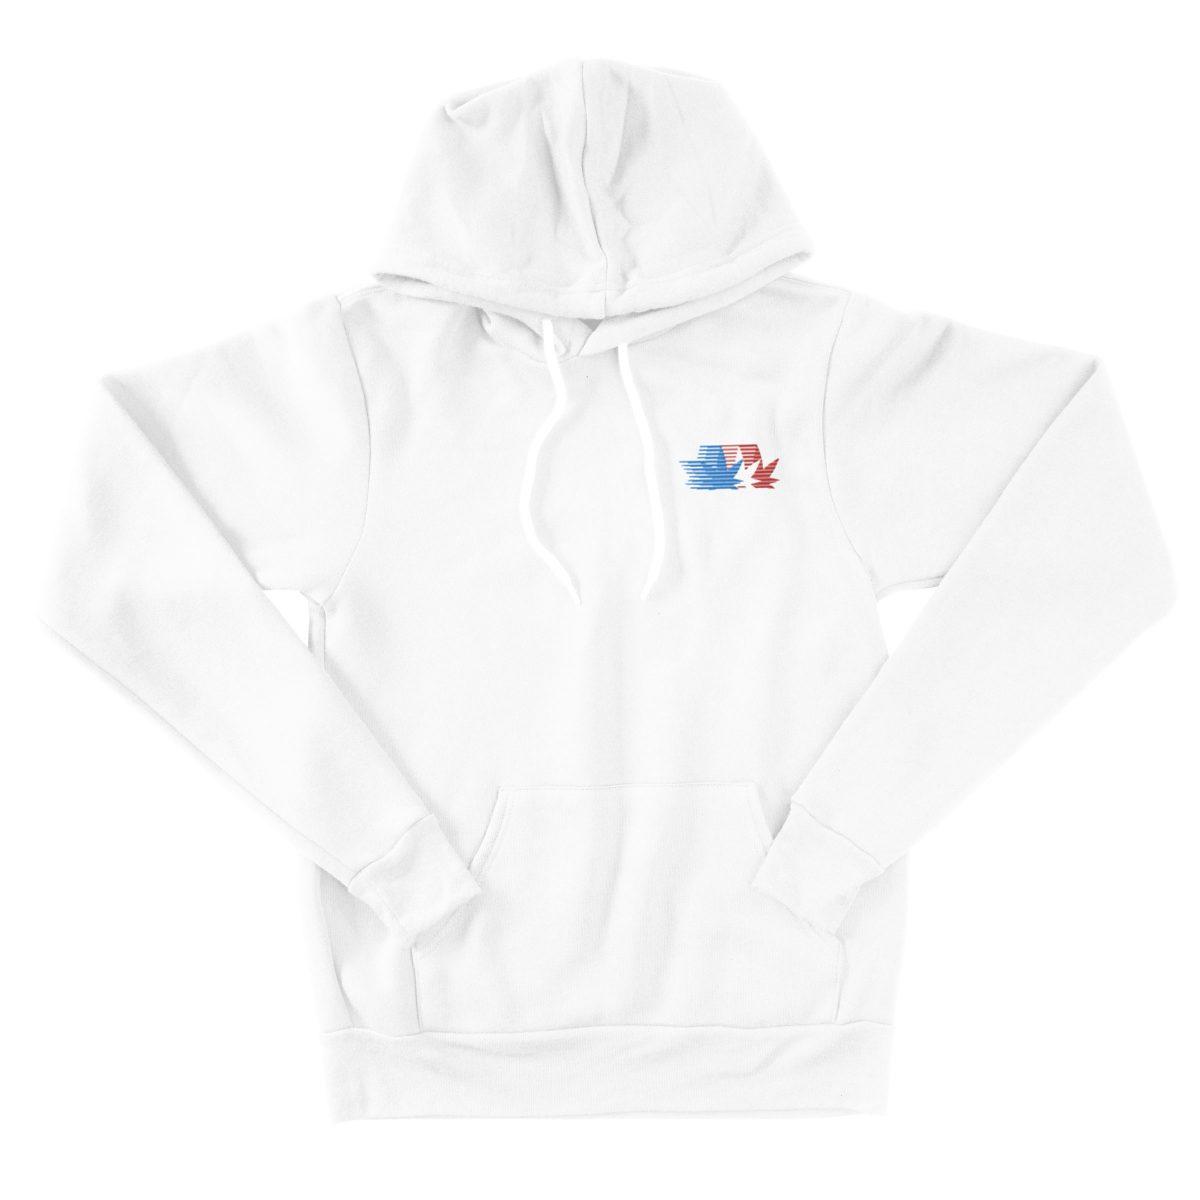 WEED OLYMPICS hoodies by kikicutt sweatshirt store